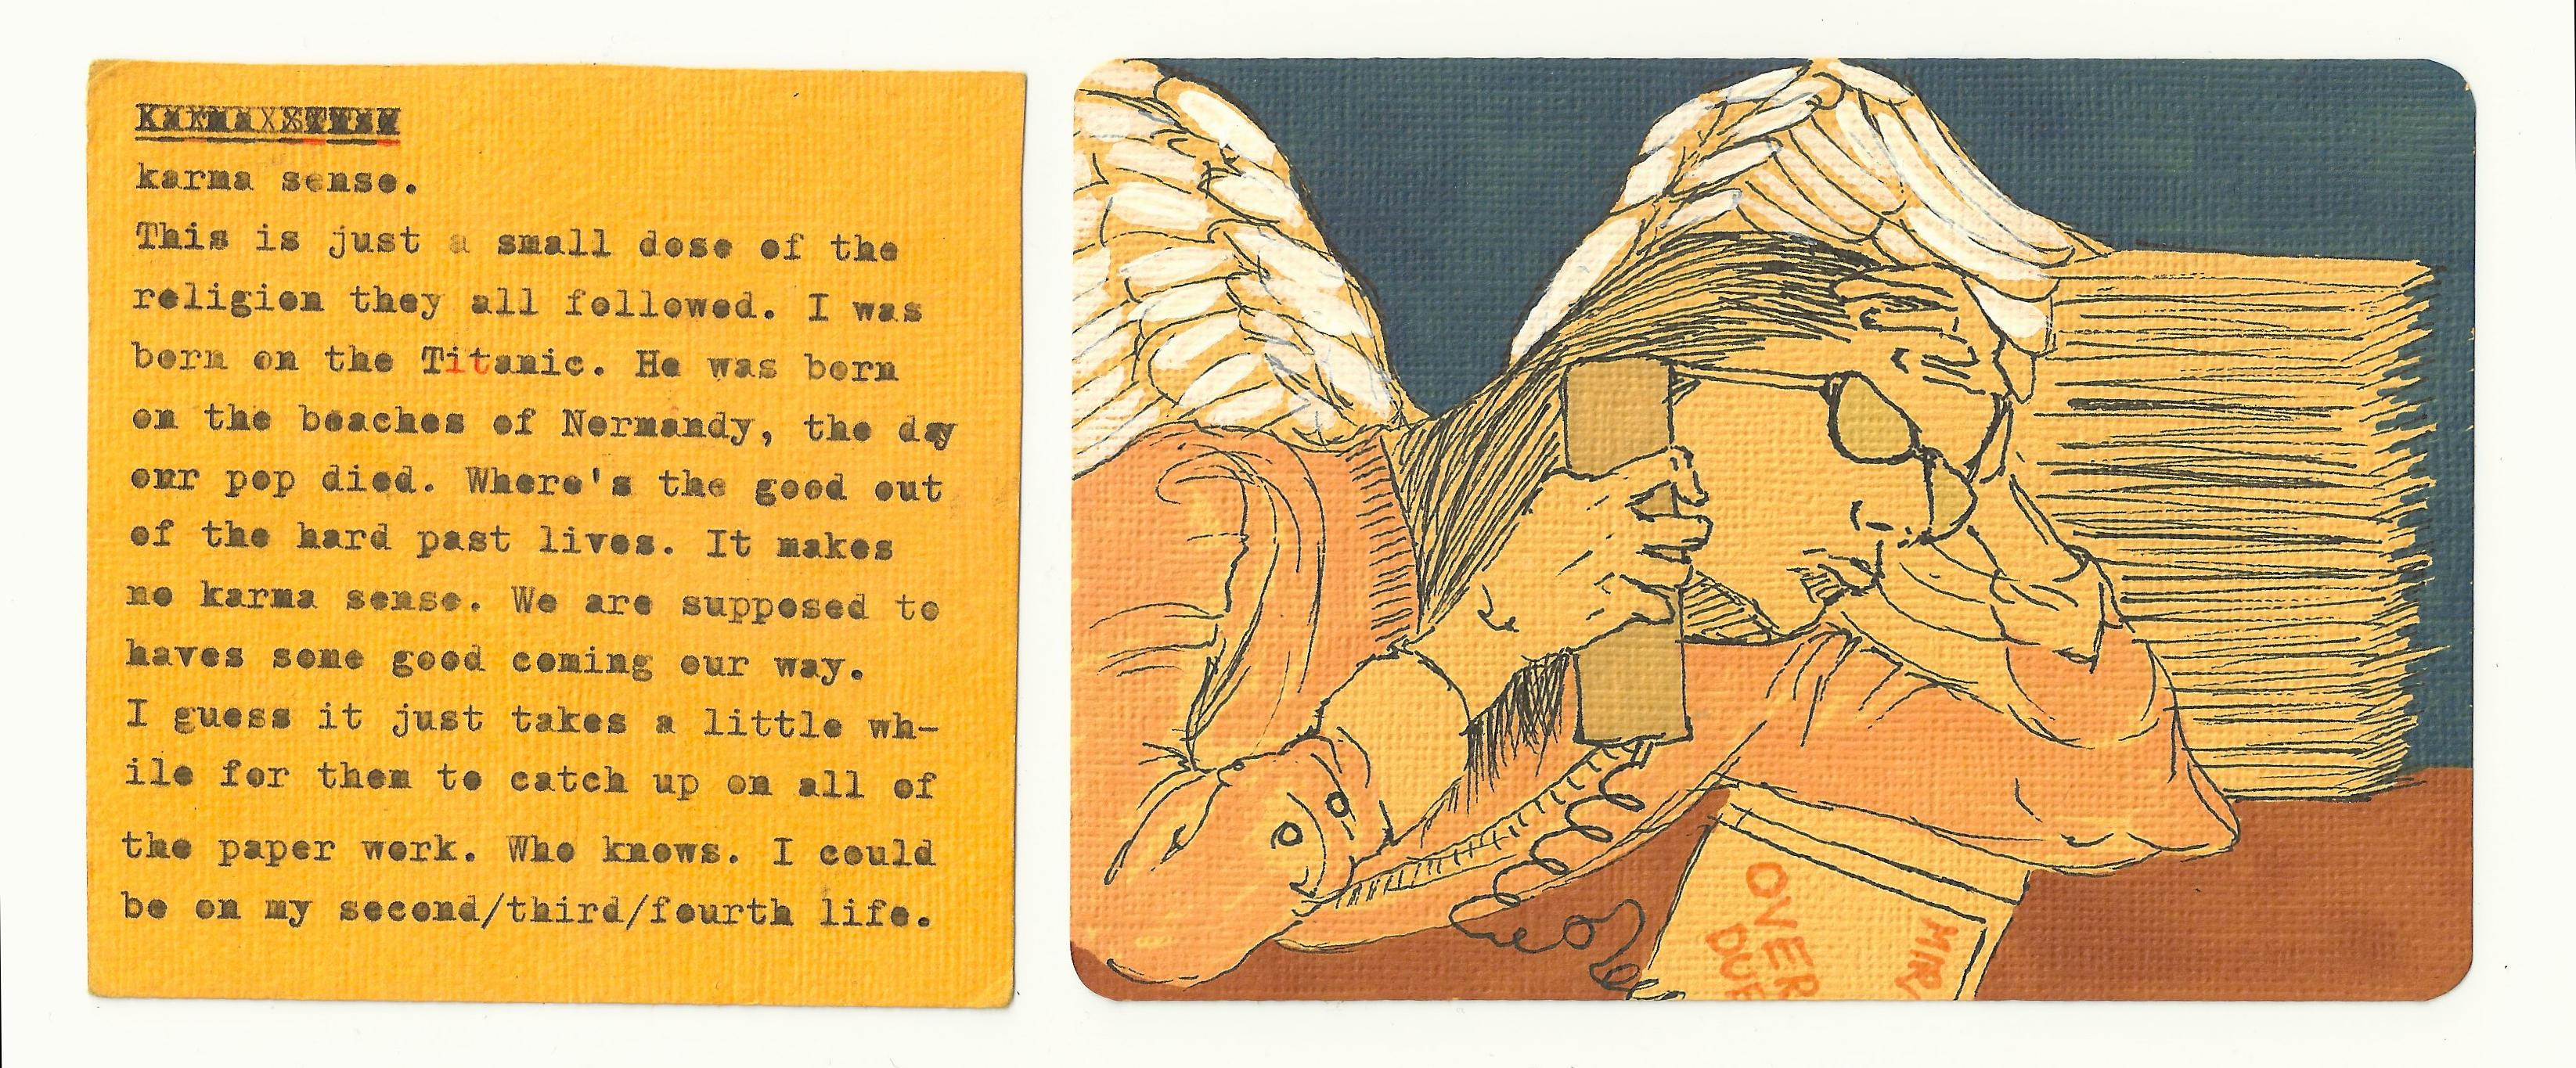 Angel on the phone